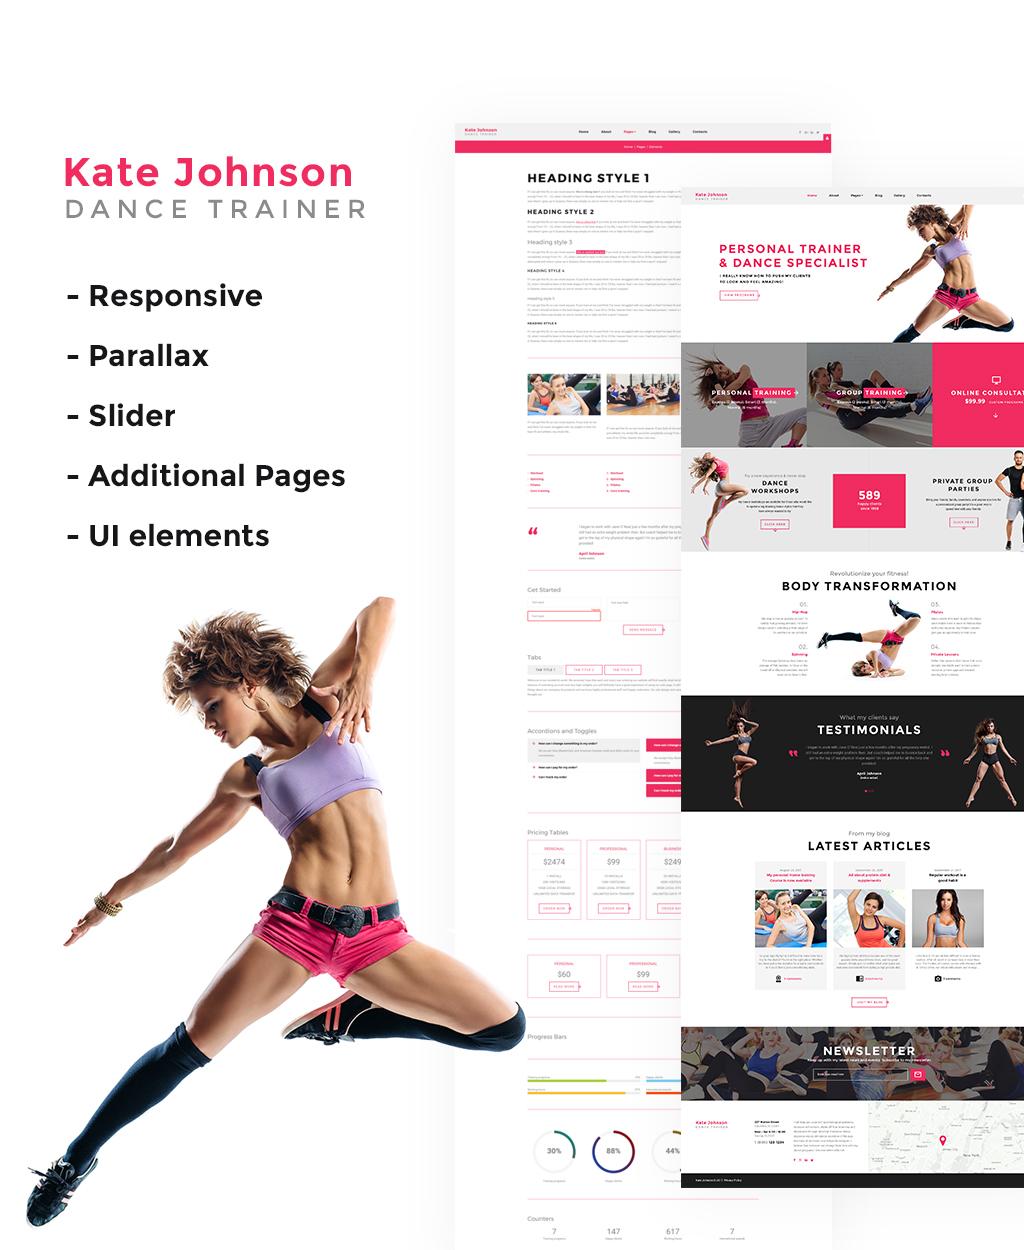 Kate Johnson - Dance Trainer Template Joomla №64899